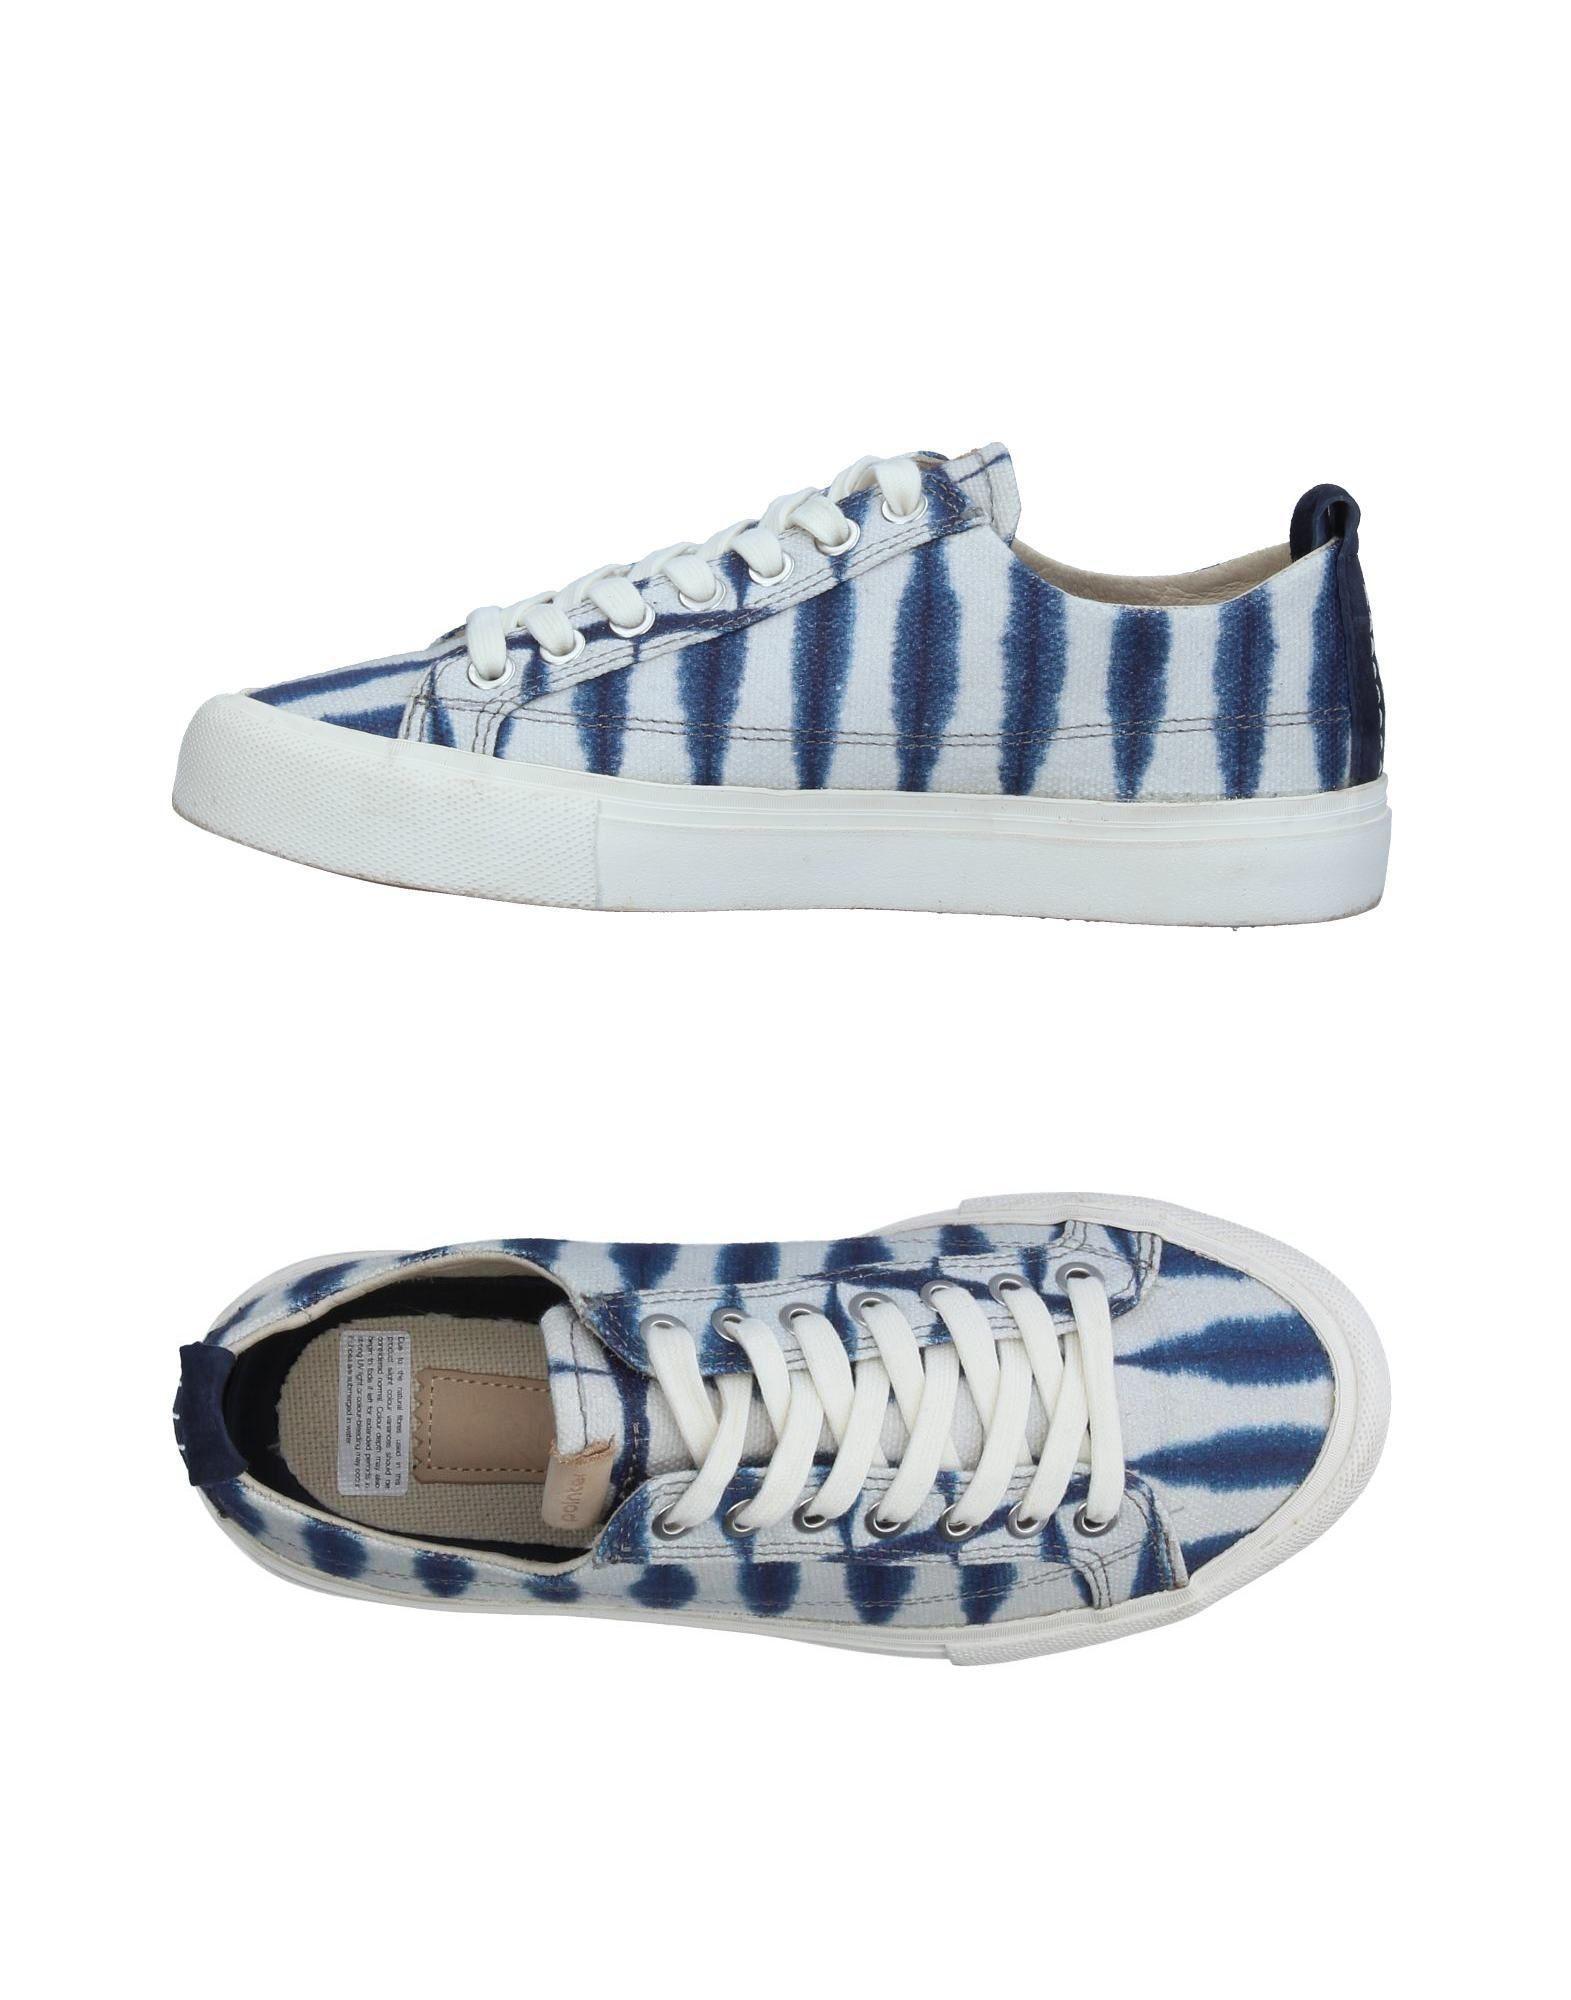 FOOTWEAR - Low-tops & sneakers on YOOX.COM Pointer j9Hd9p3jdW